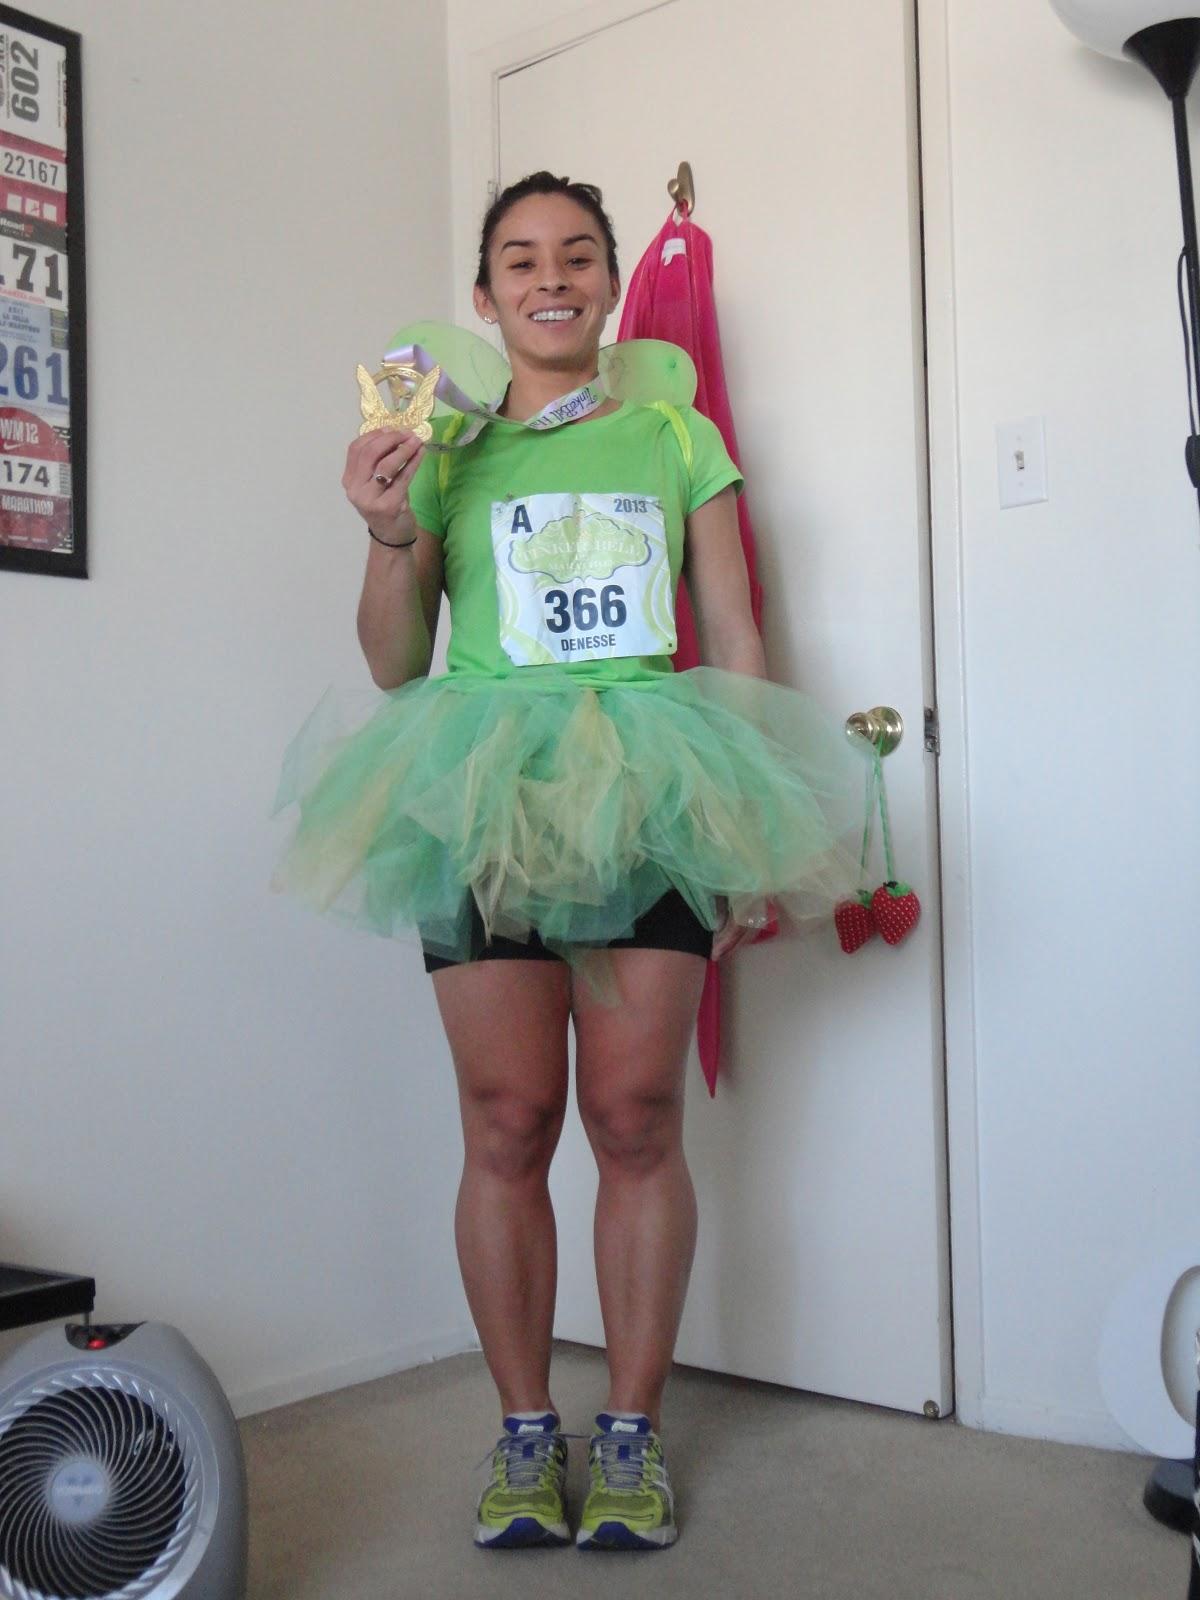 sprint. run. jog: How to make a Tinkerbell costume